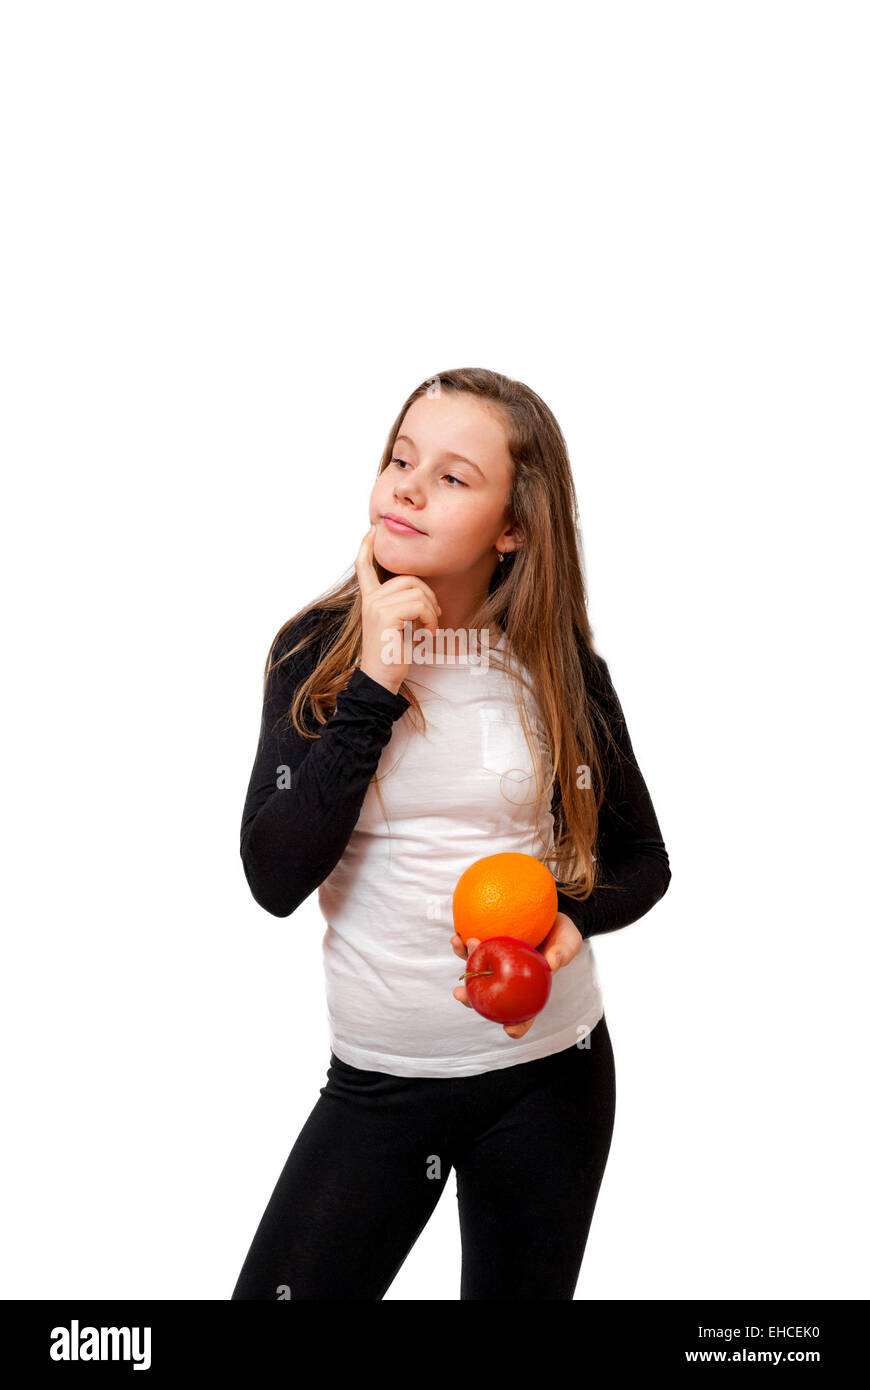 Thinking little girl with orange and apple isolated on white - Stock Image